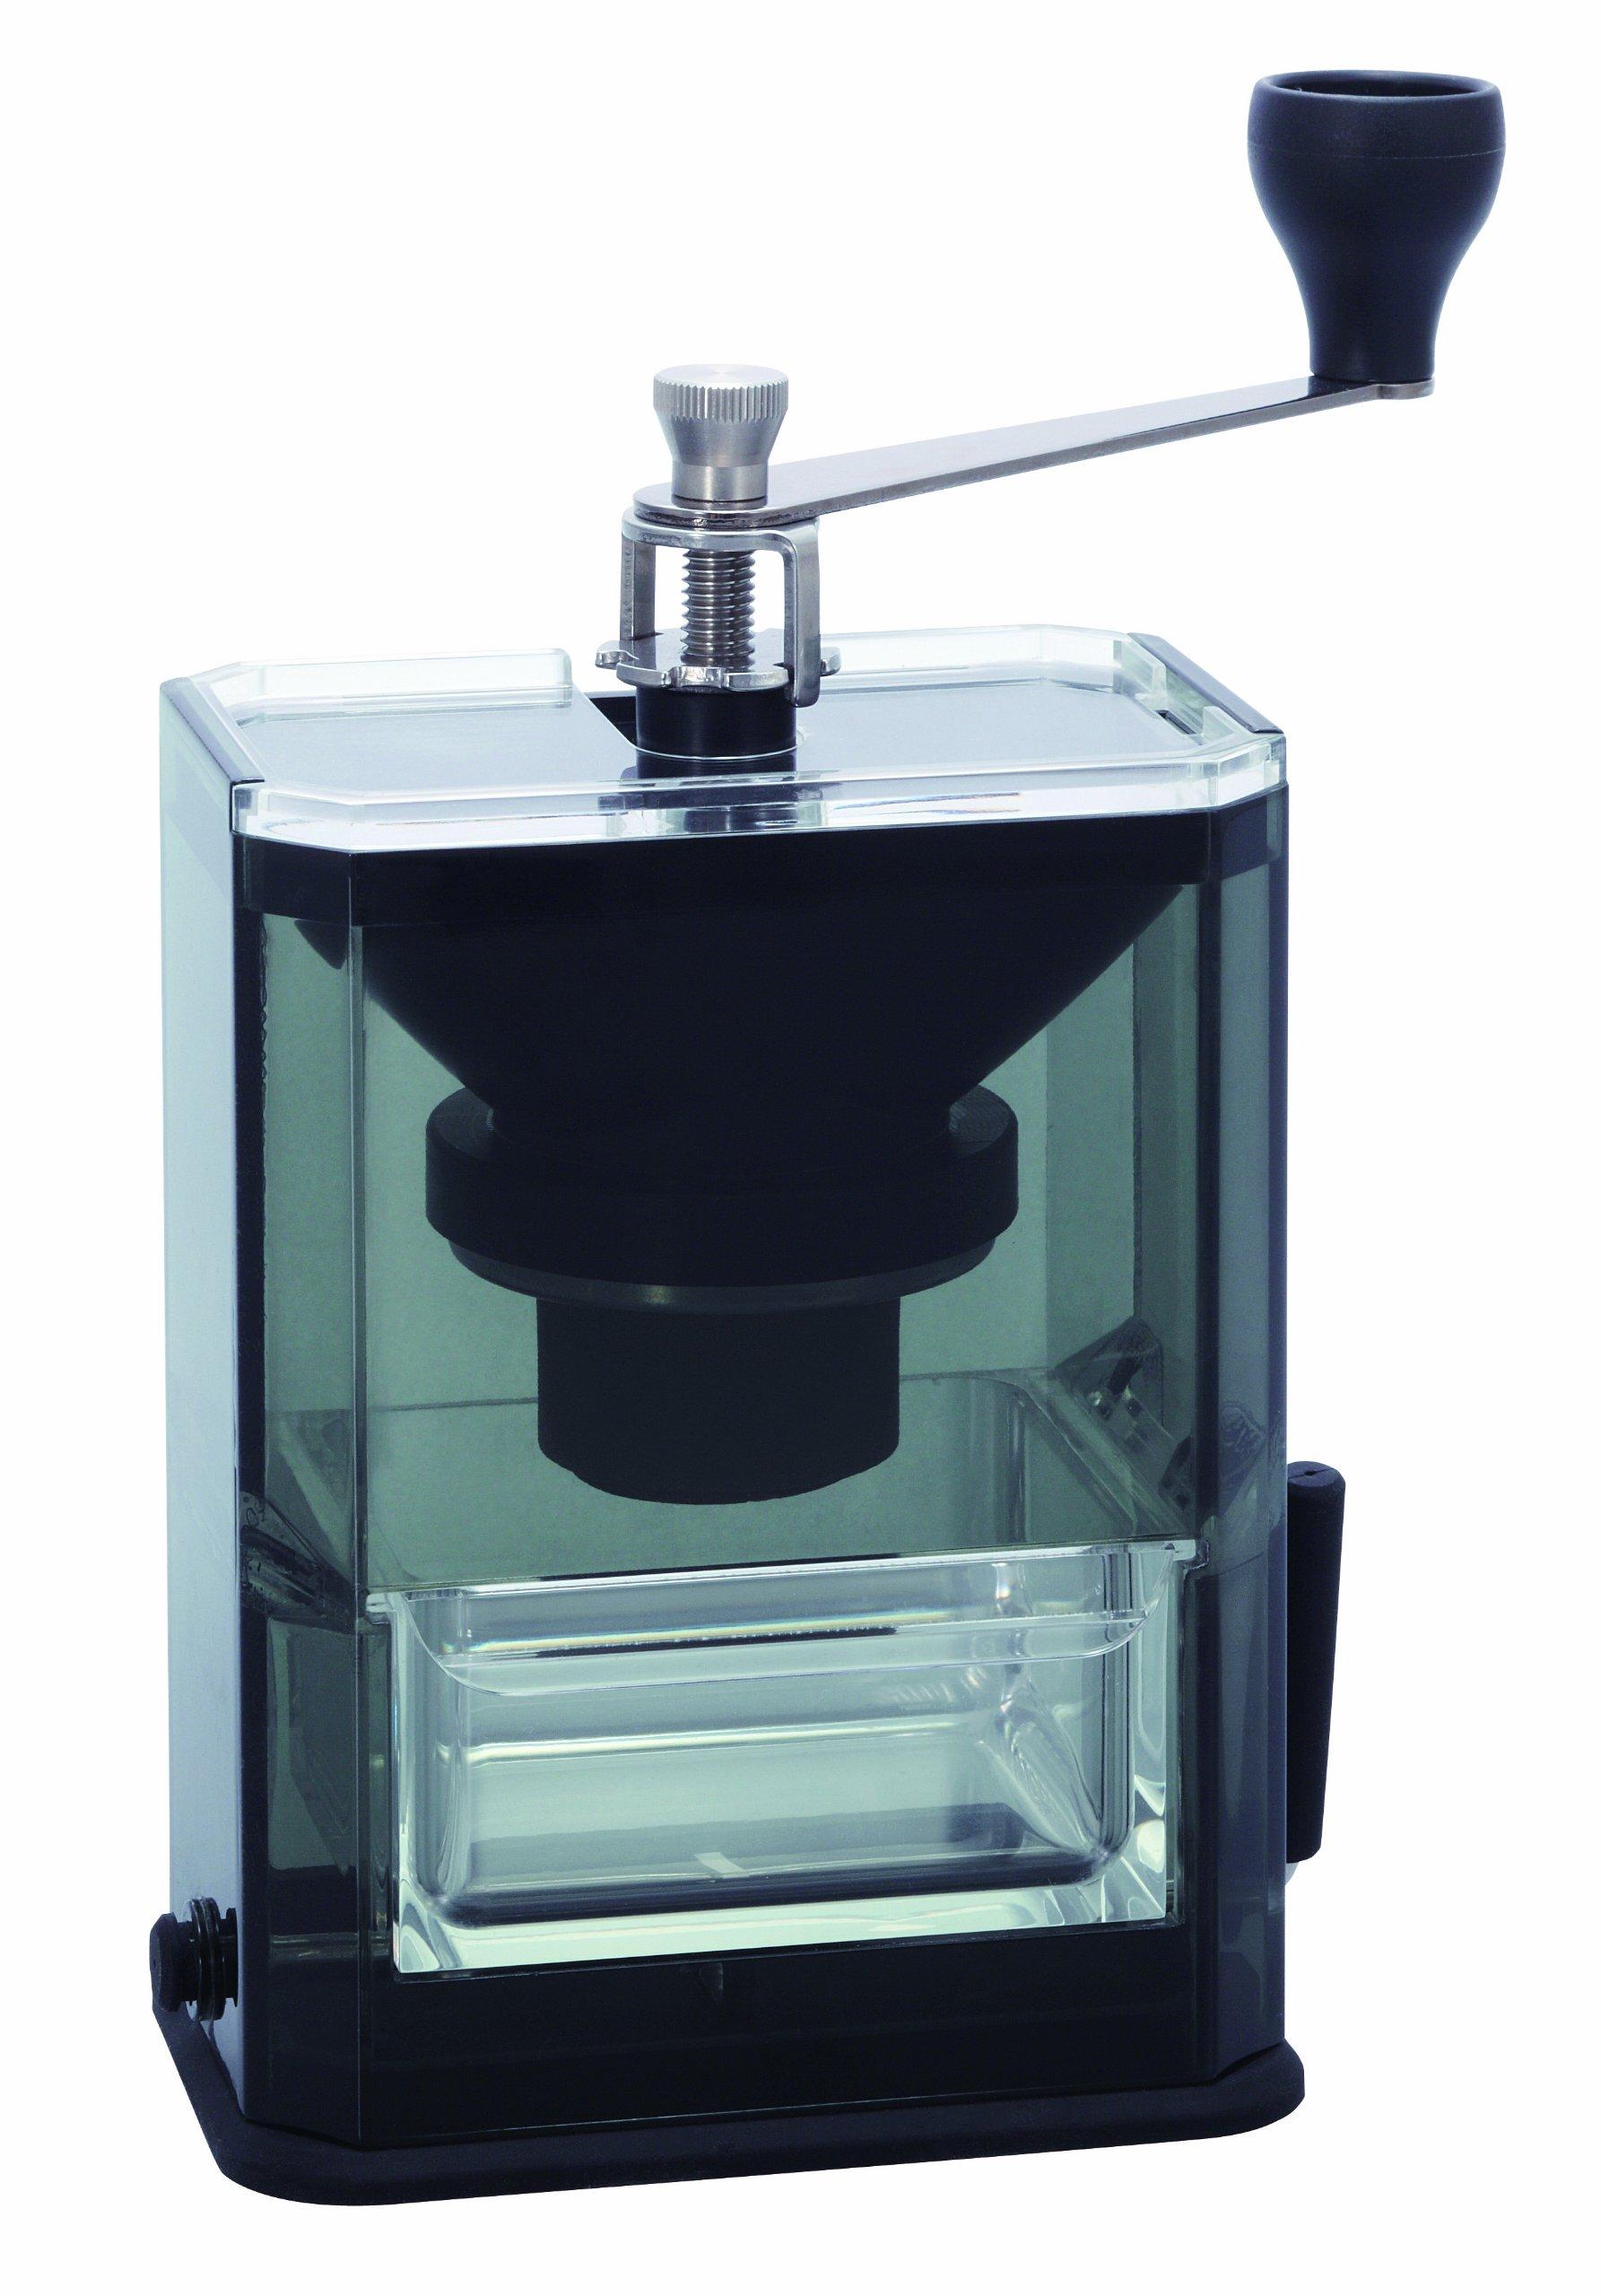 Hario Clear Acrylic Ceramic Coffee Mill Manual Grinder, 40g by Hario